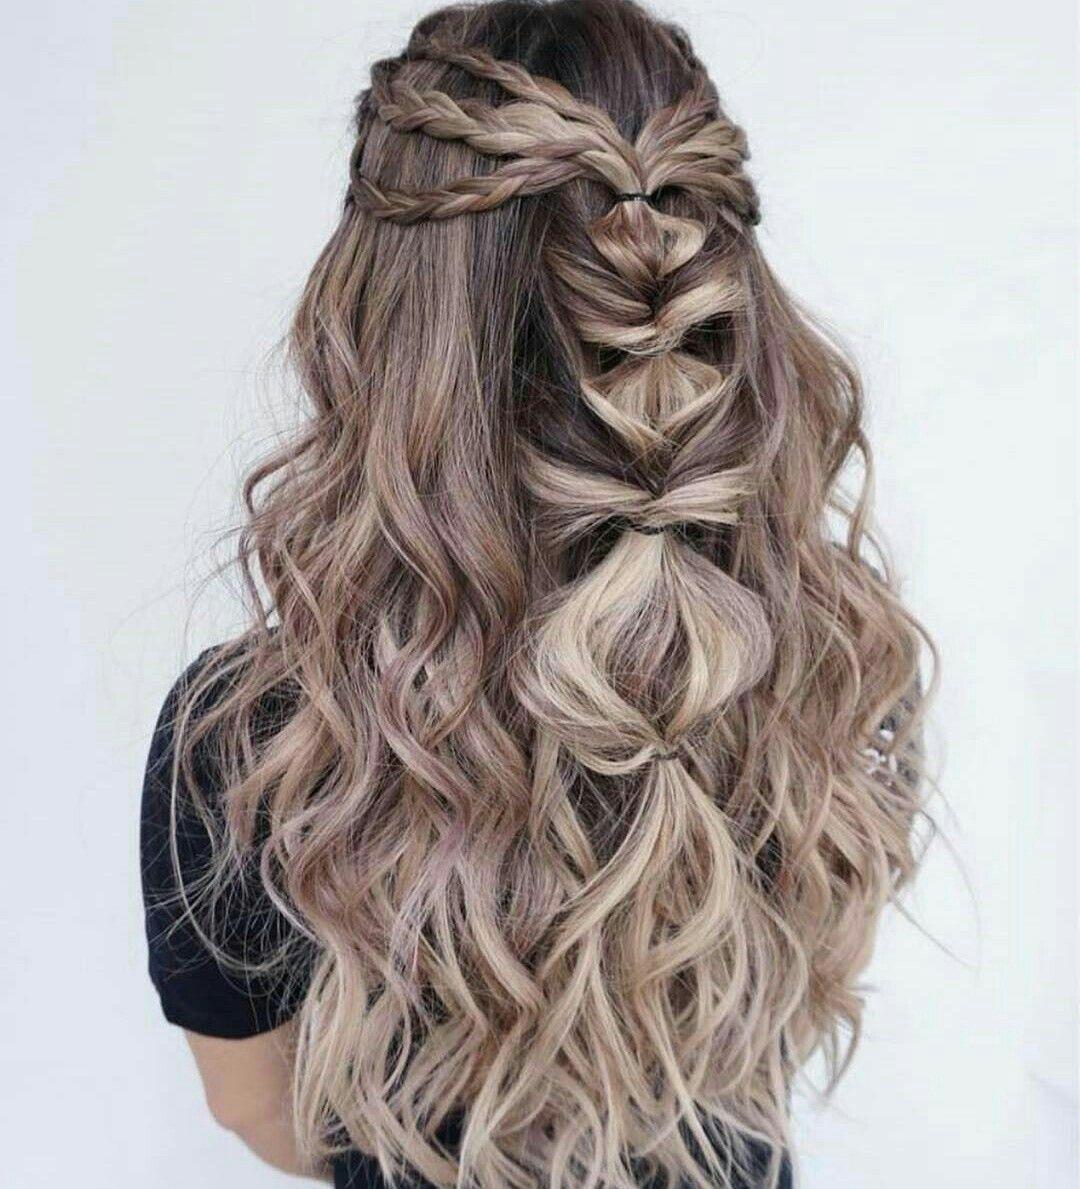 Pin by b e l l a on тαиgℓє pinterest hair hair styles